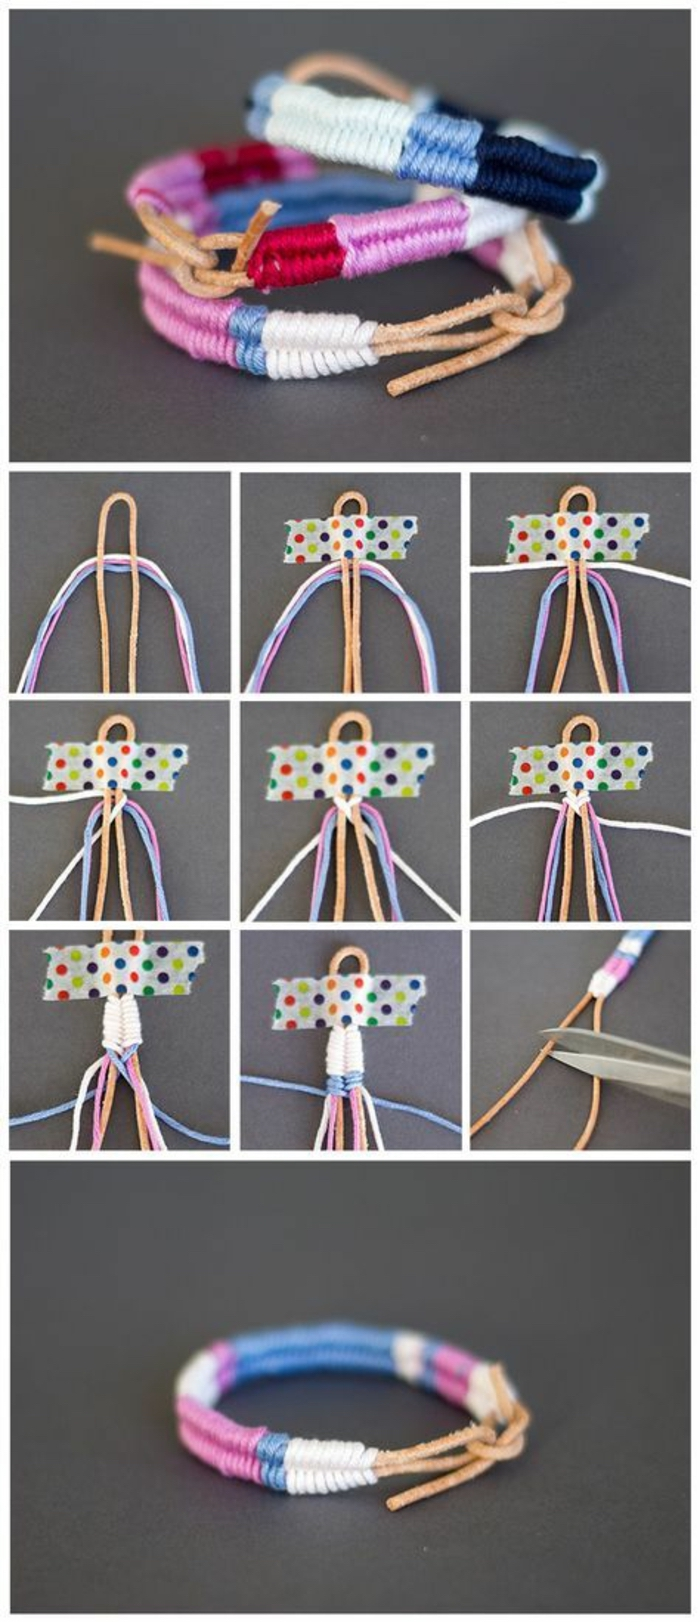 braided bracelet, craft gifts, colourful yarn, diy tutorial, step by step